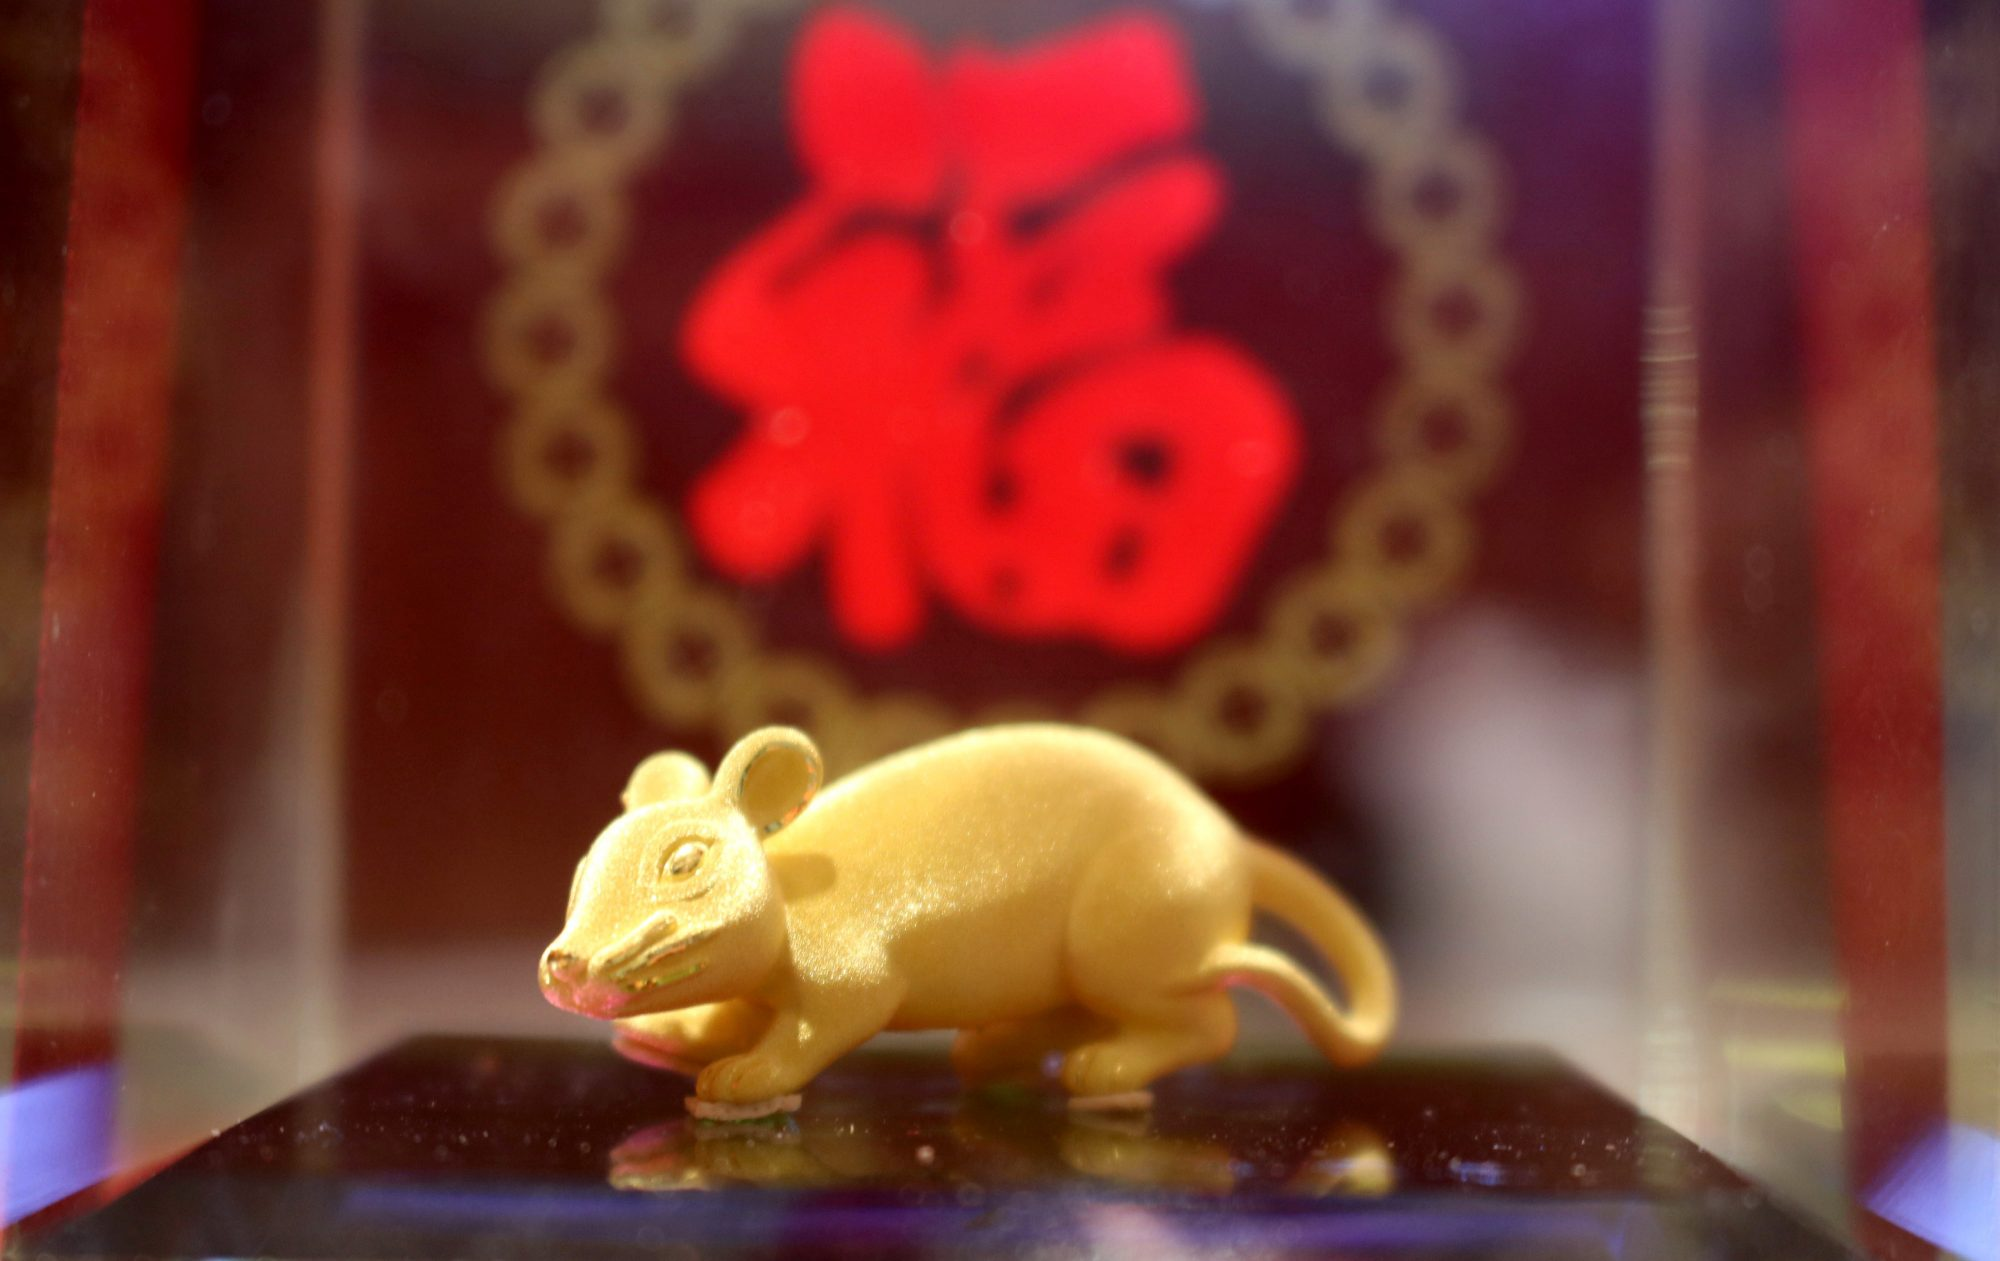 Rata de Metal, horóscopo chino, 2020